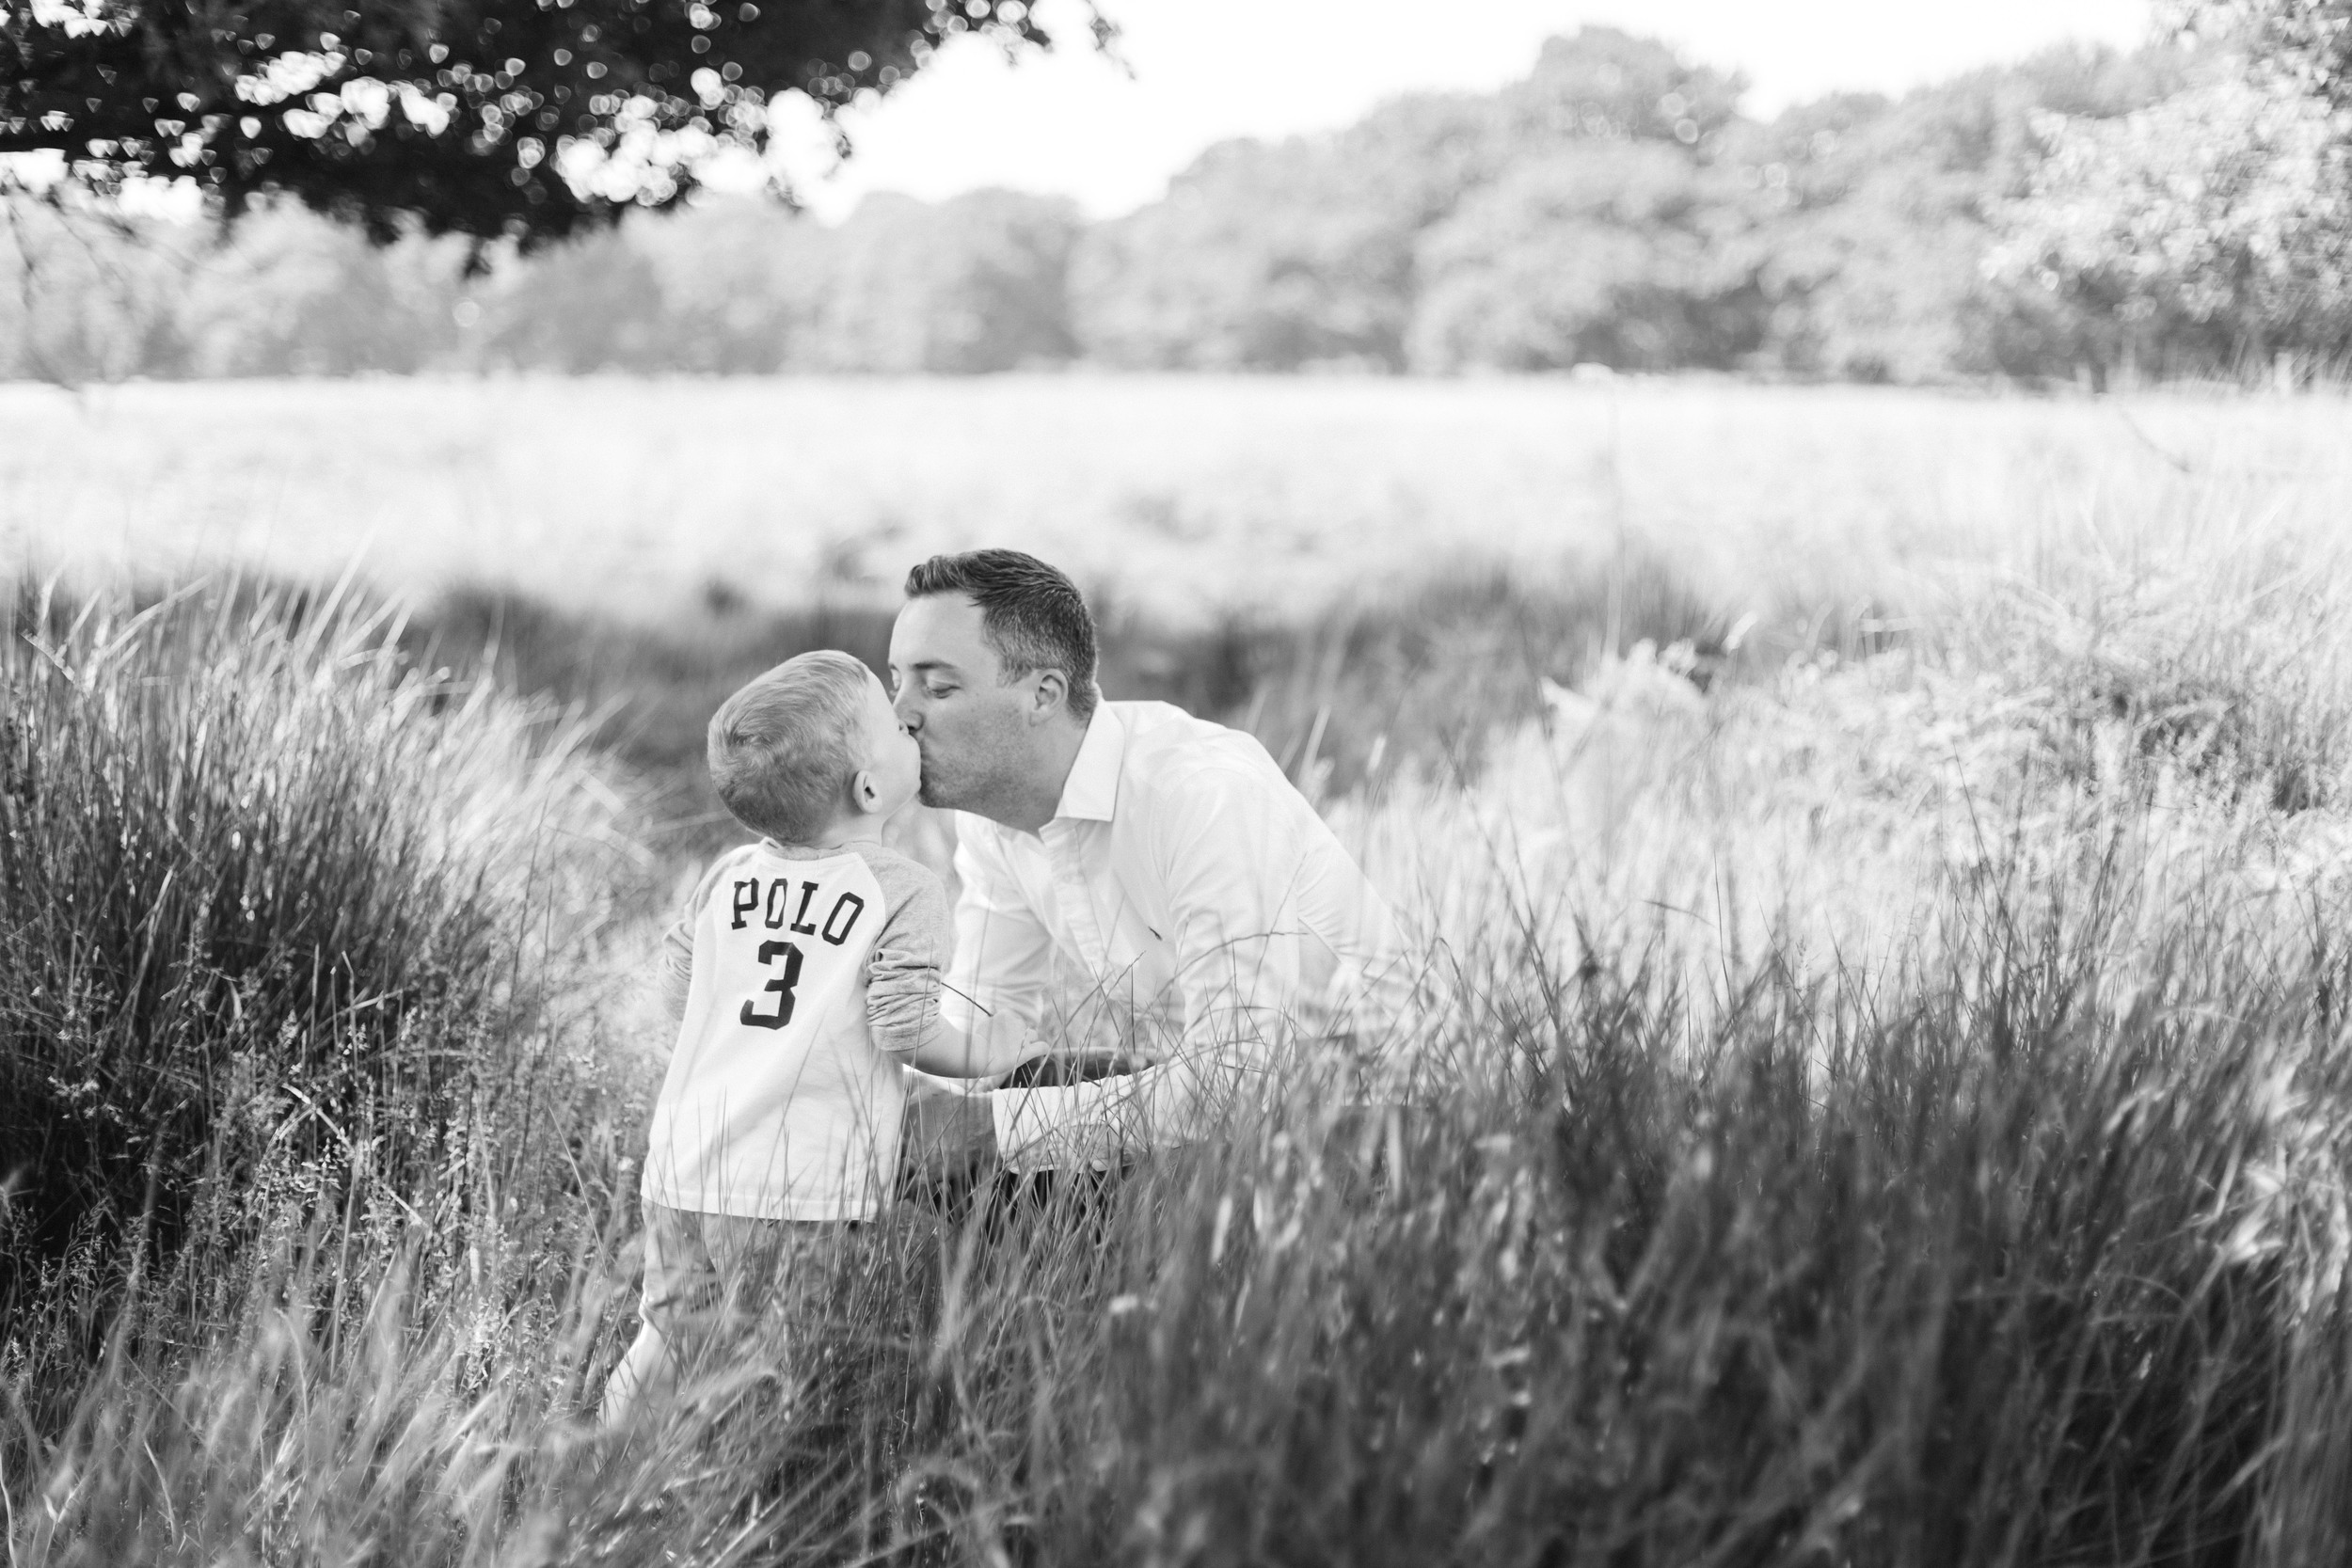 Lelya_LittleKinPhotography_family_photoshoot_Richmond-18.jpg